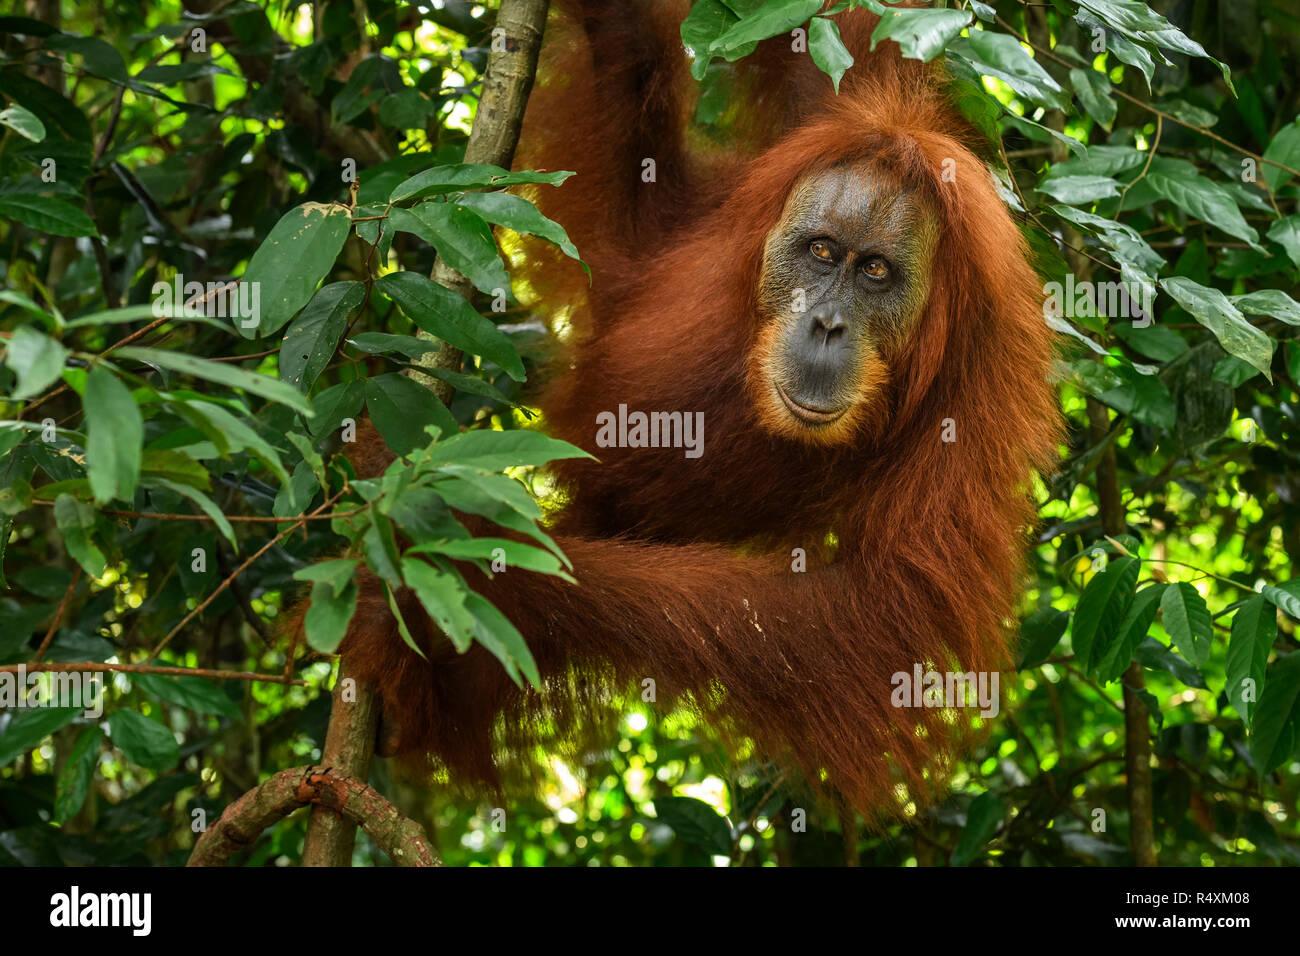 Sumatran Orang-utan - Pongo abelii, hominid primate from Sumatran forests, Indonesia. Stock Photo